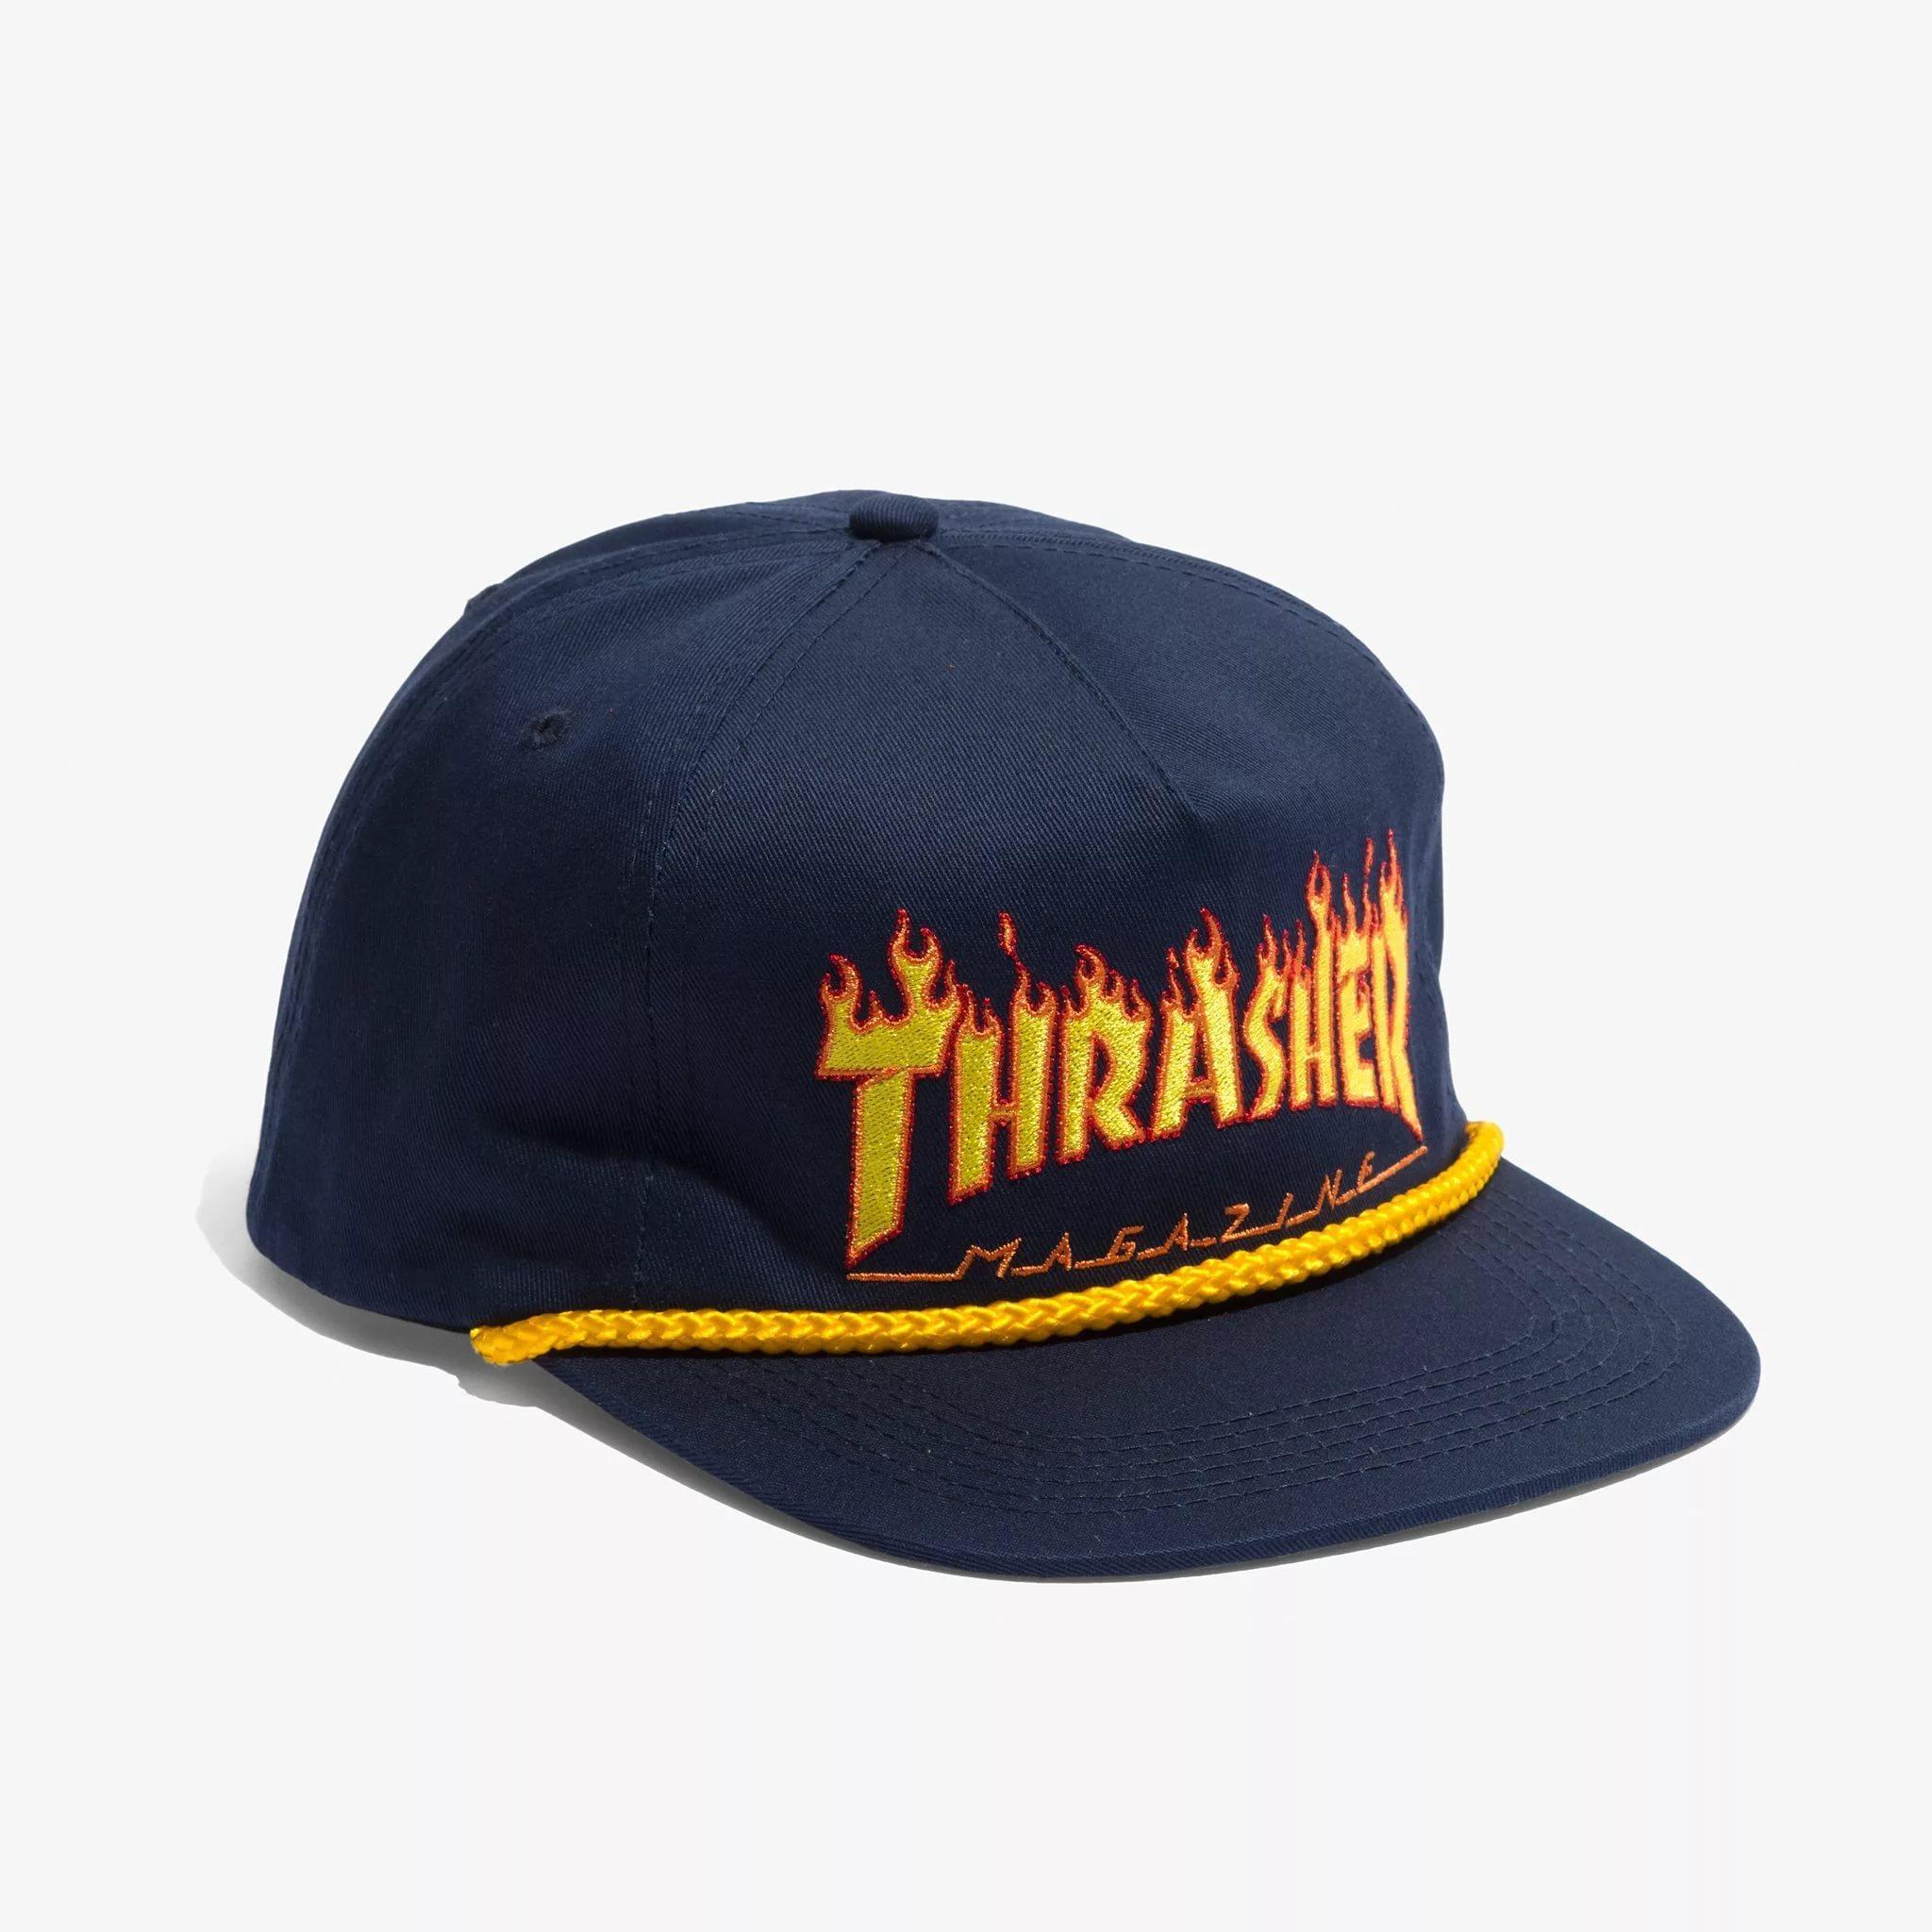 Футболки и кепки фирмы Thrasher